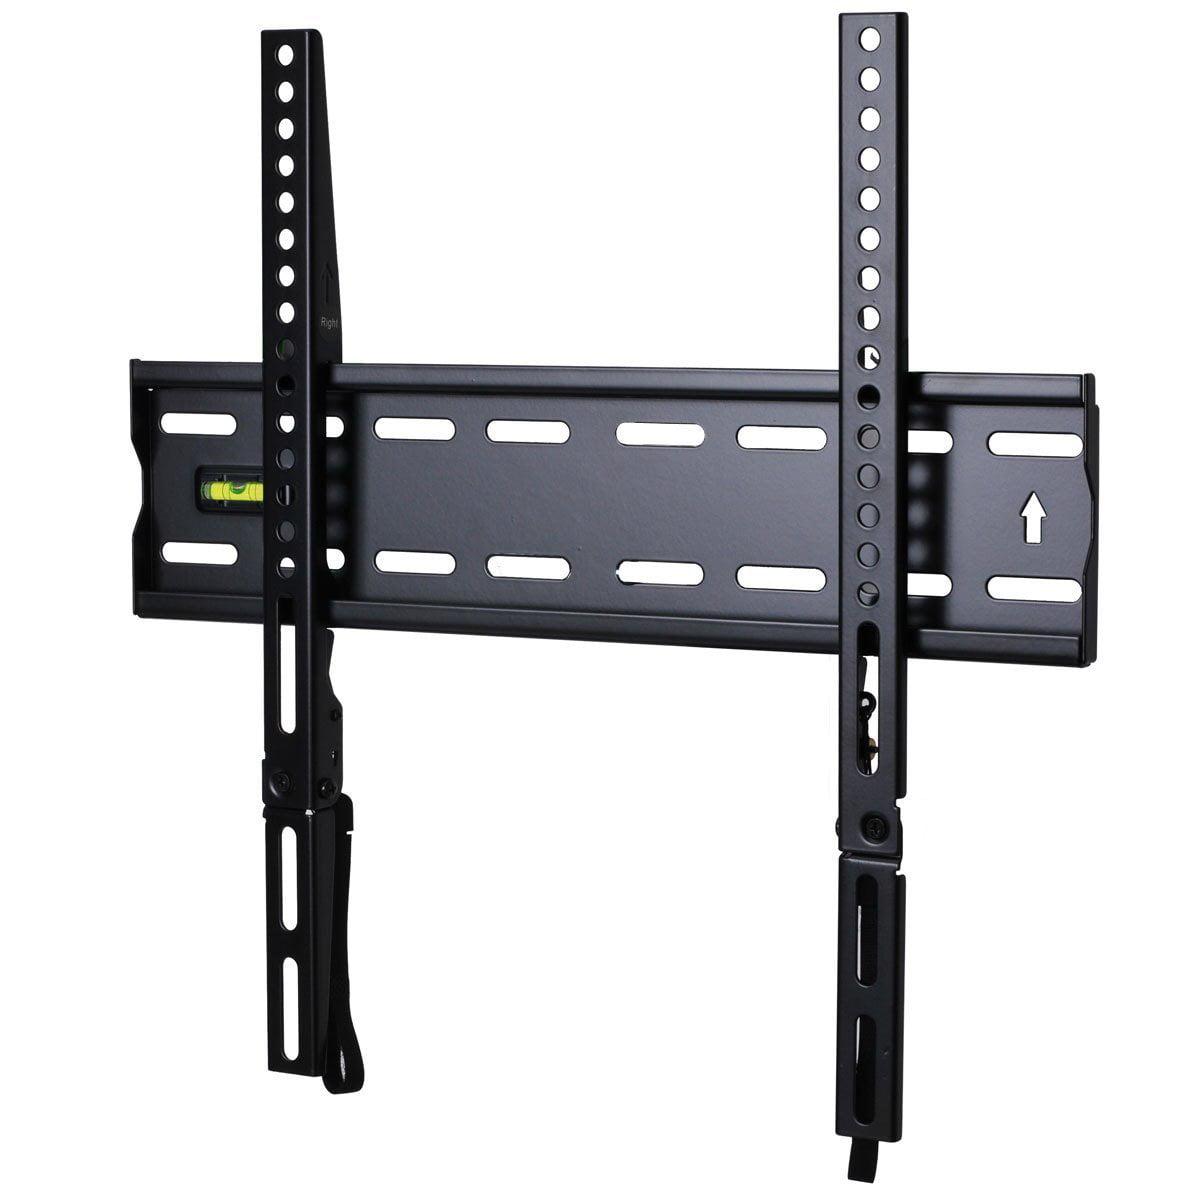 Ultra Slim TV Wall Mount for Samsung LN32D450 PN51E440 PN...